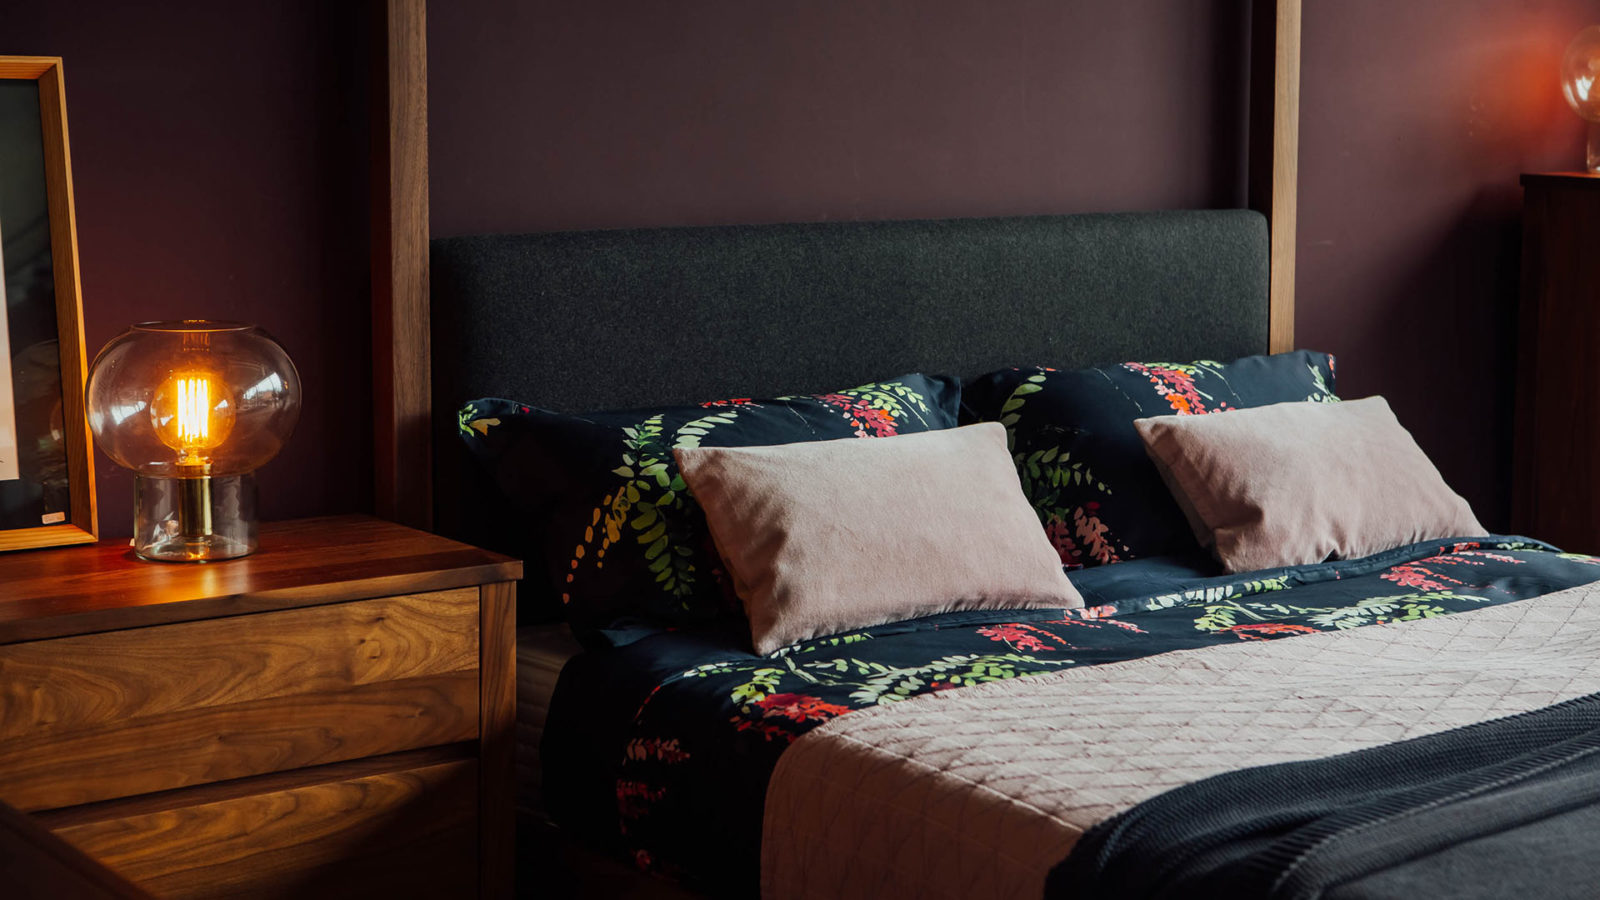 crimson-print-bedding-with-blush-pink-stockholm-&-cushions